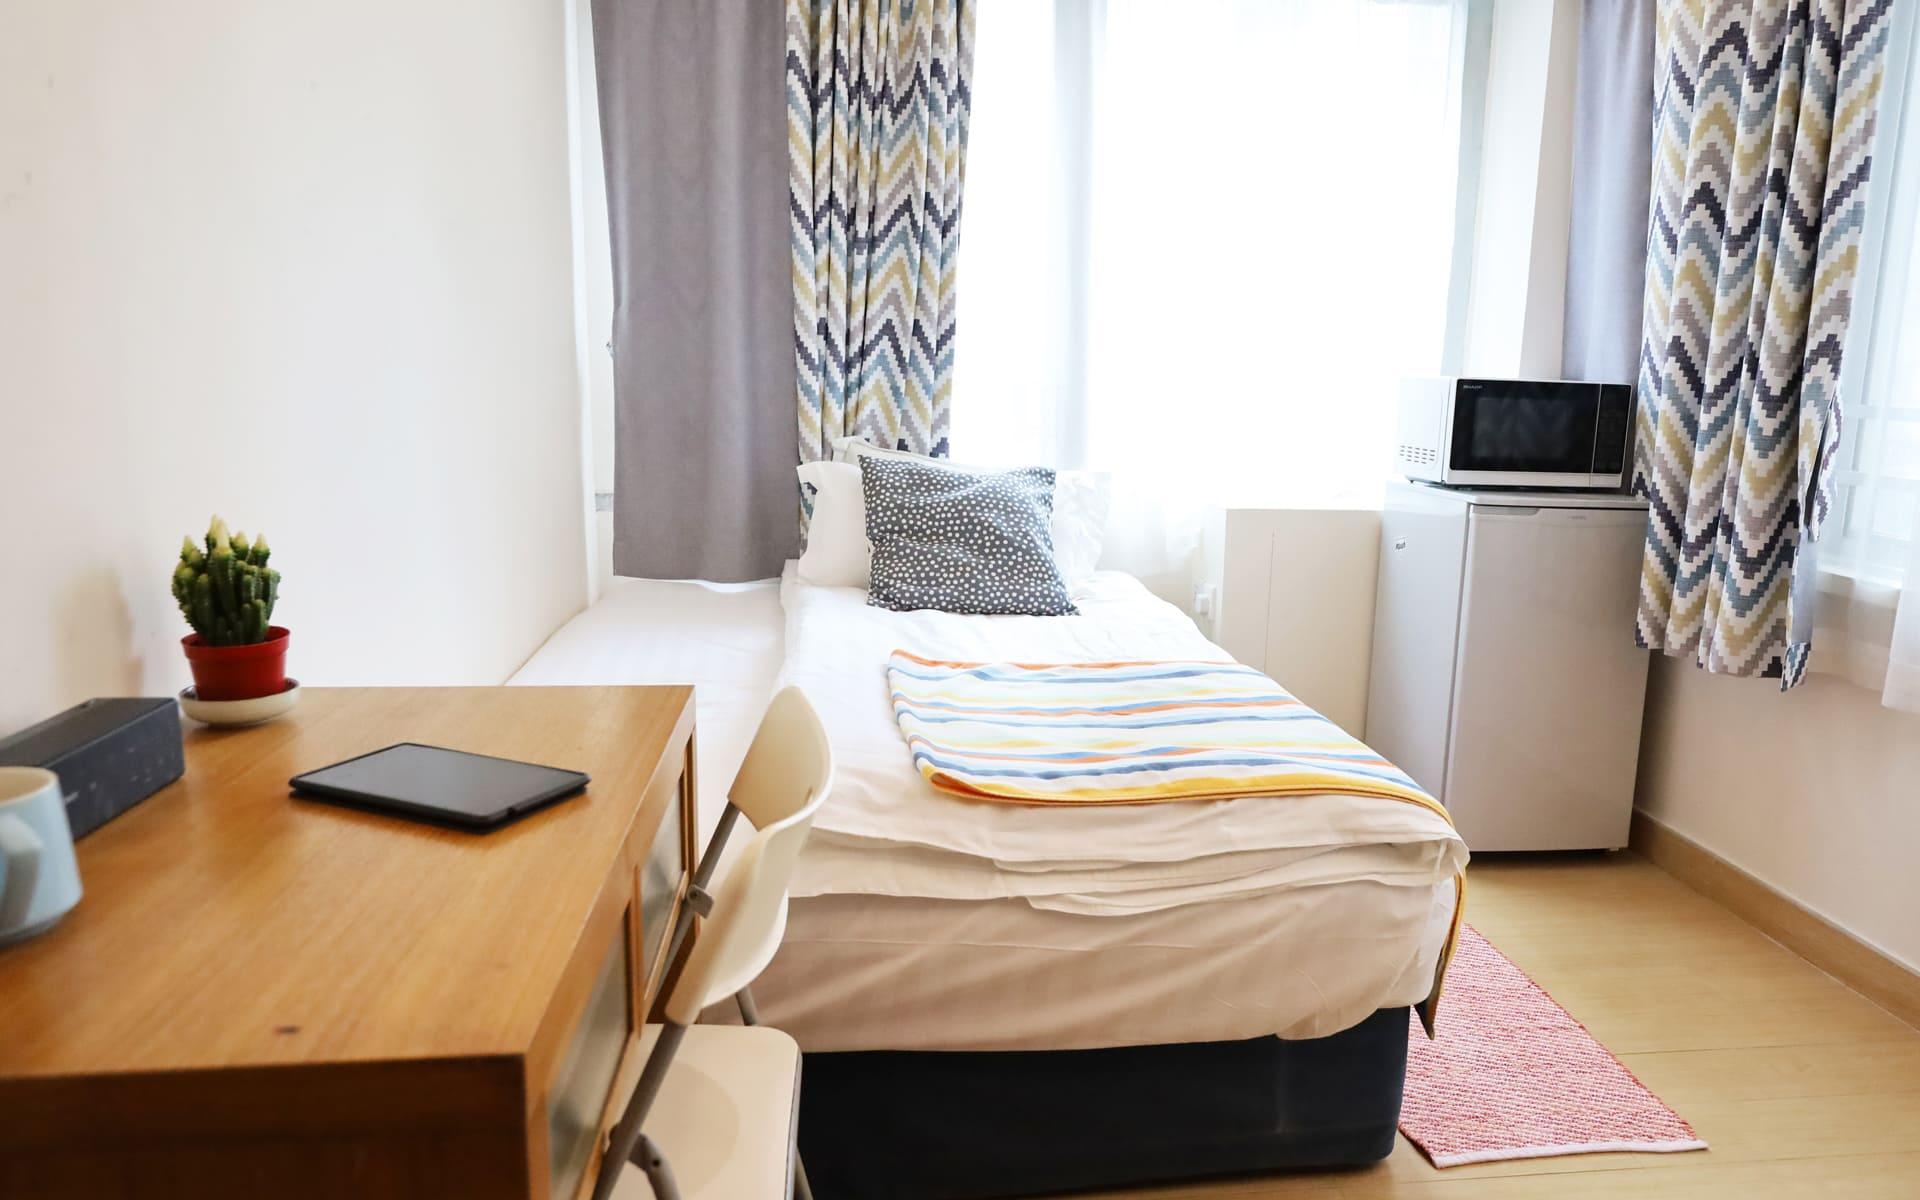 hk_service_apartment_10376784961596784481.jpg